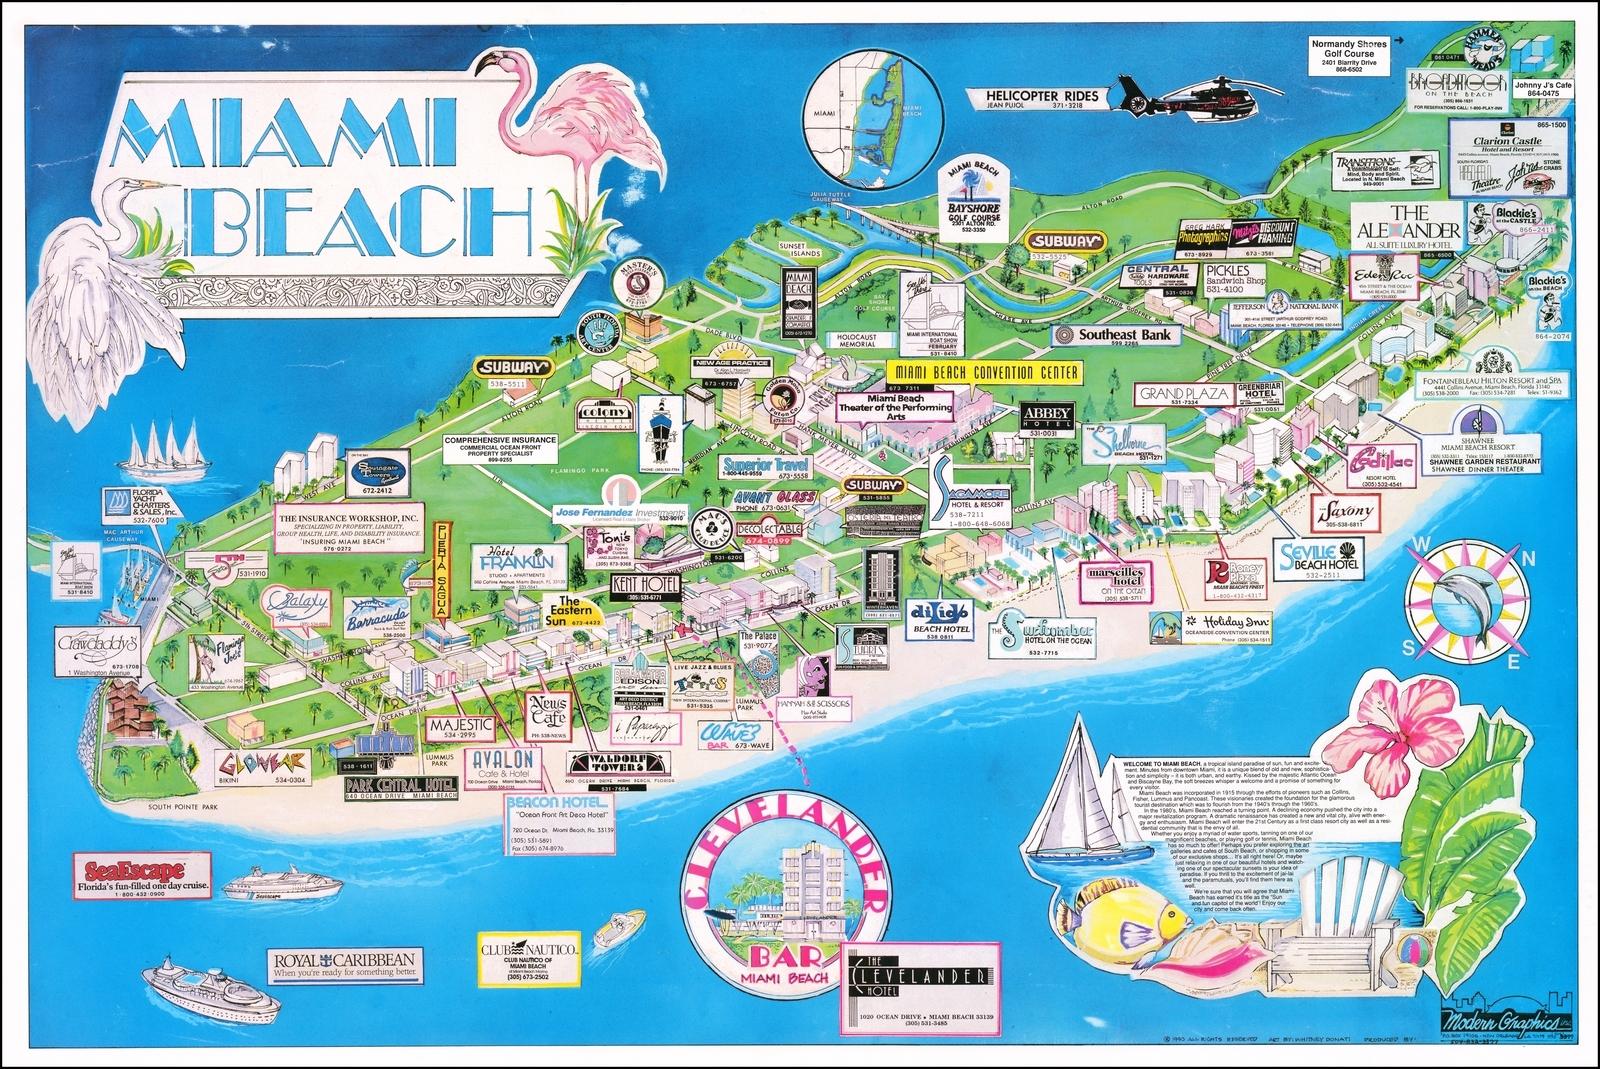 Miami Beach - Barry Lawrence Ruderman Antique Maps Inc. regarding Map Of Miami Beach Area